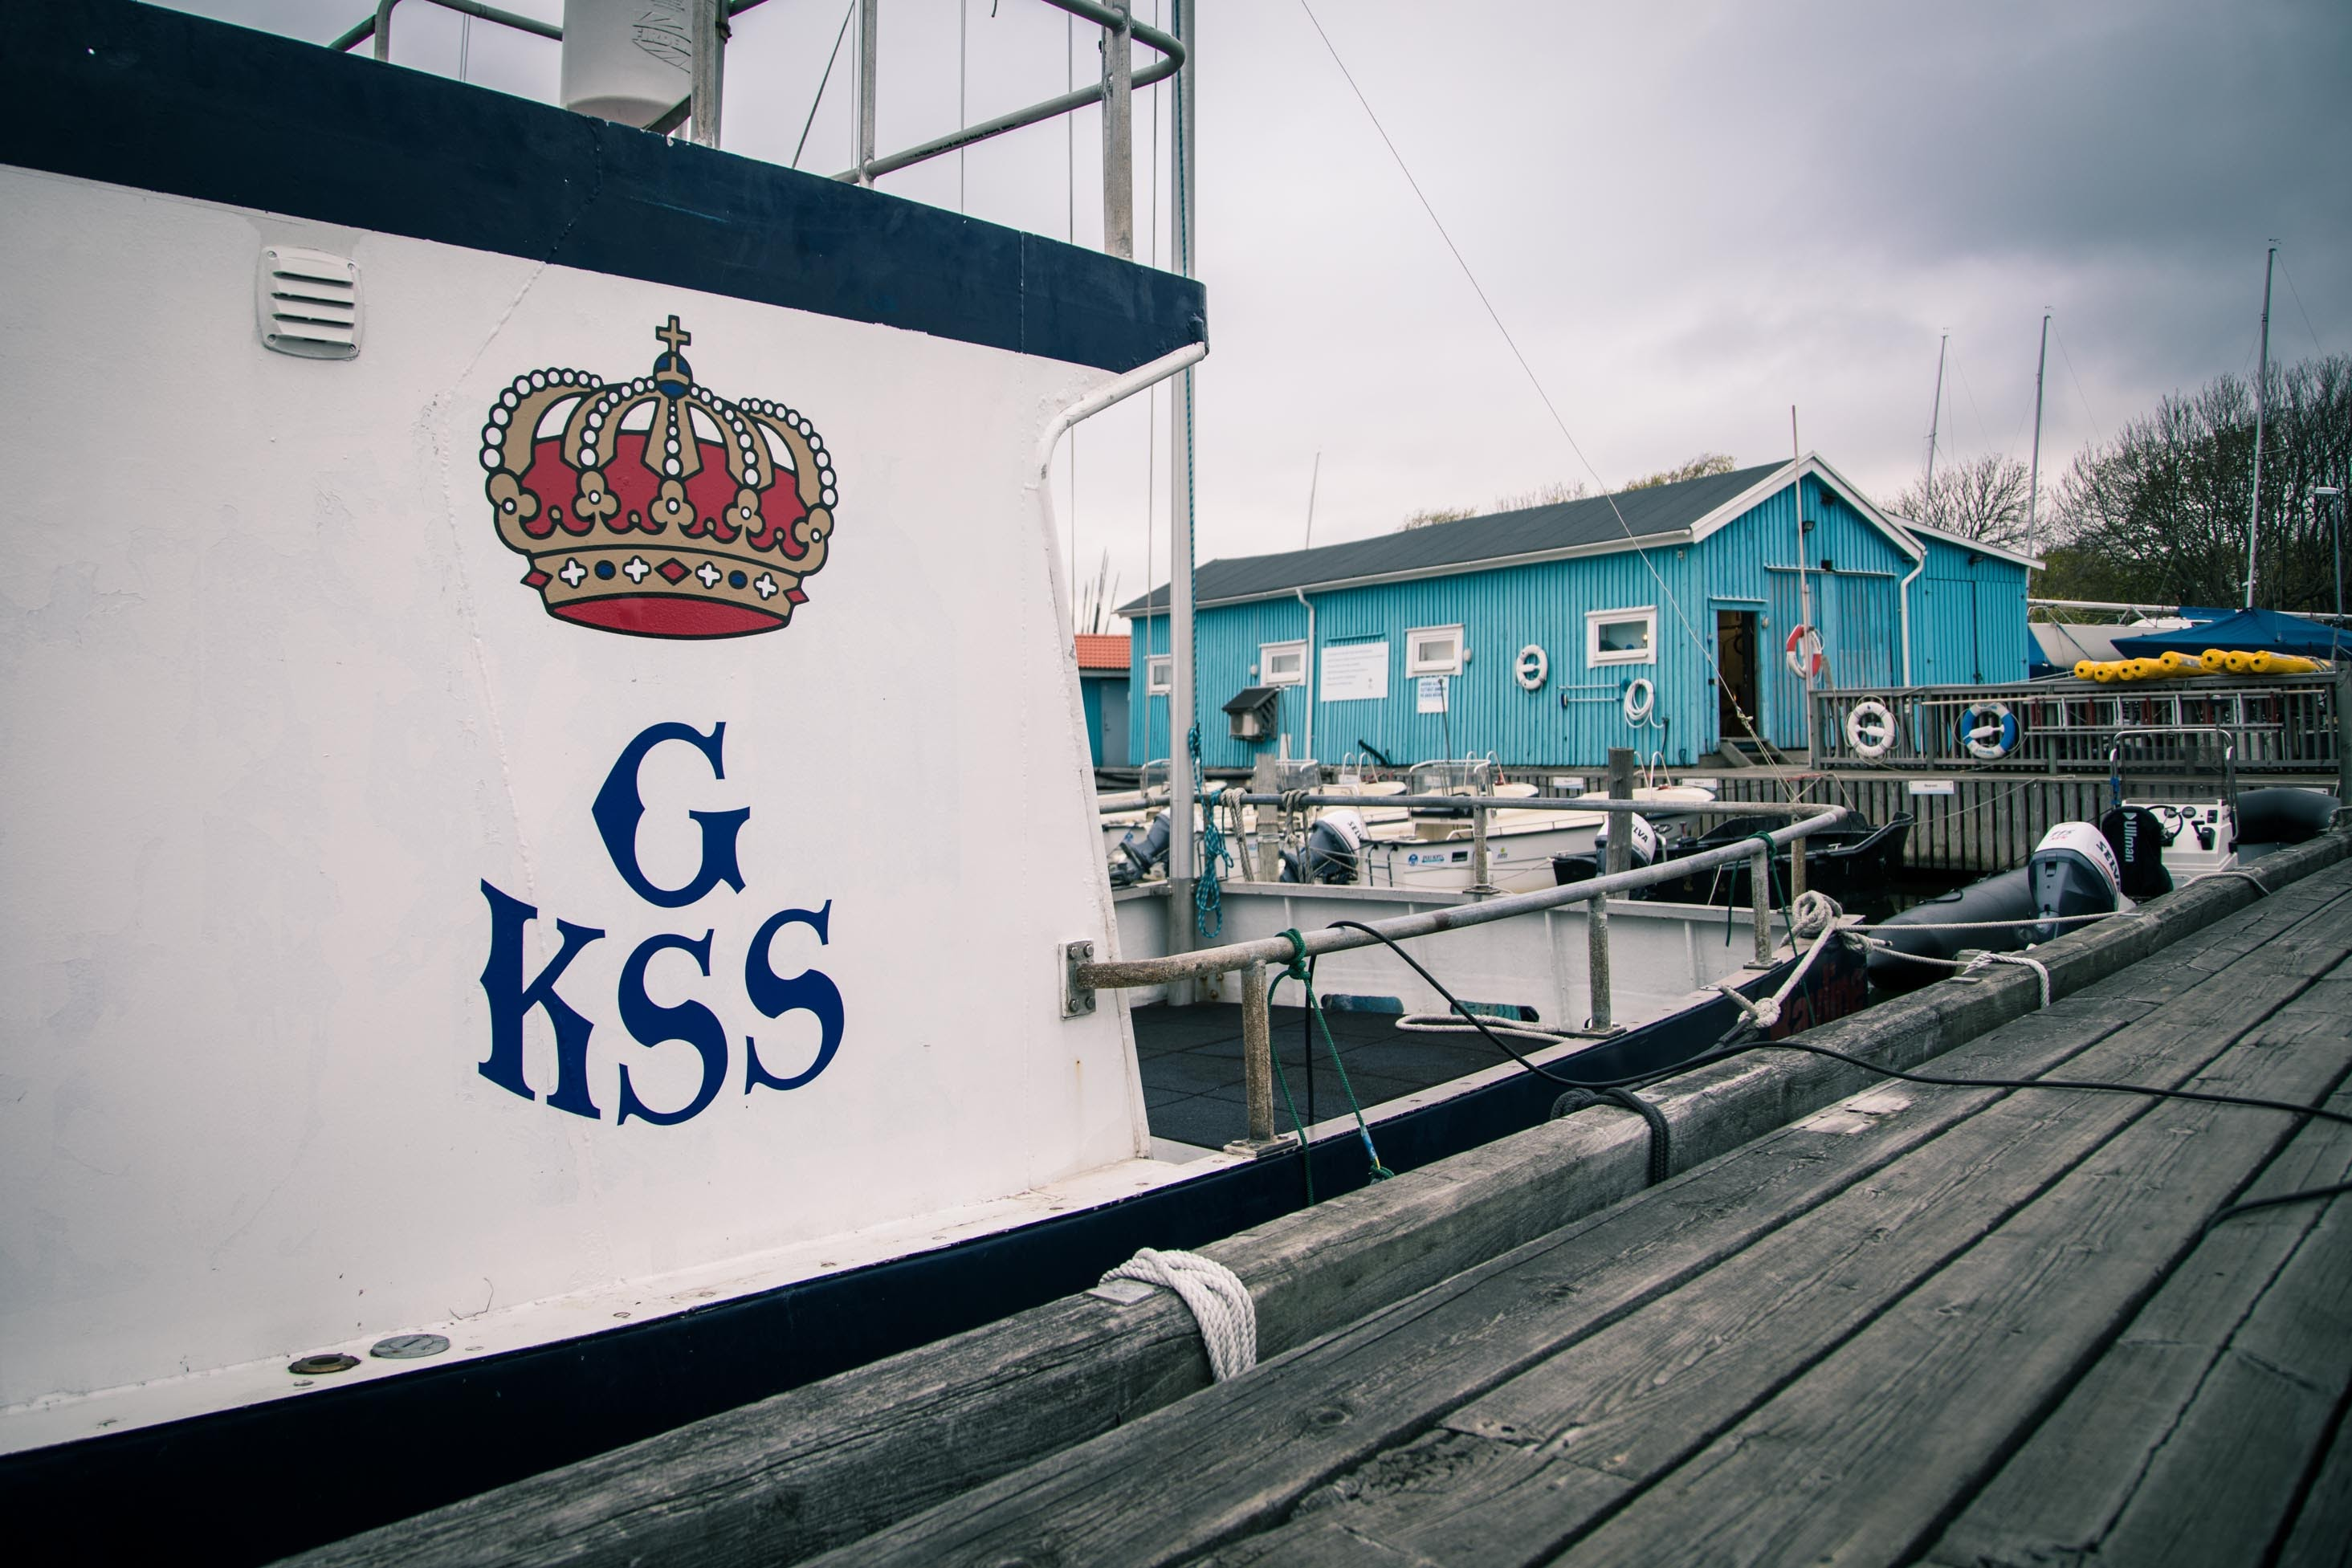 GKSS Logo on boat